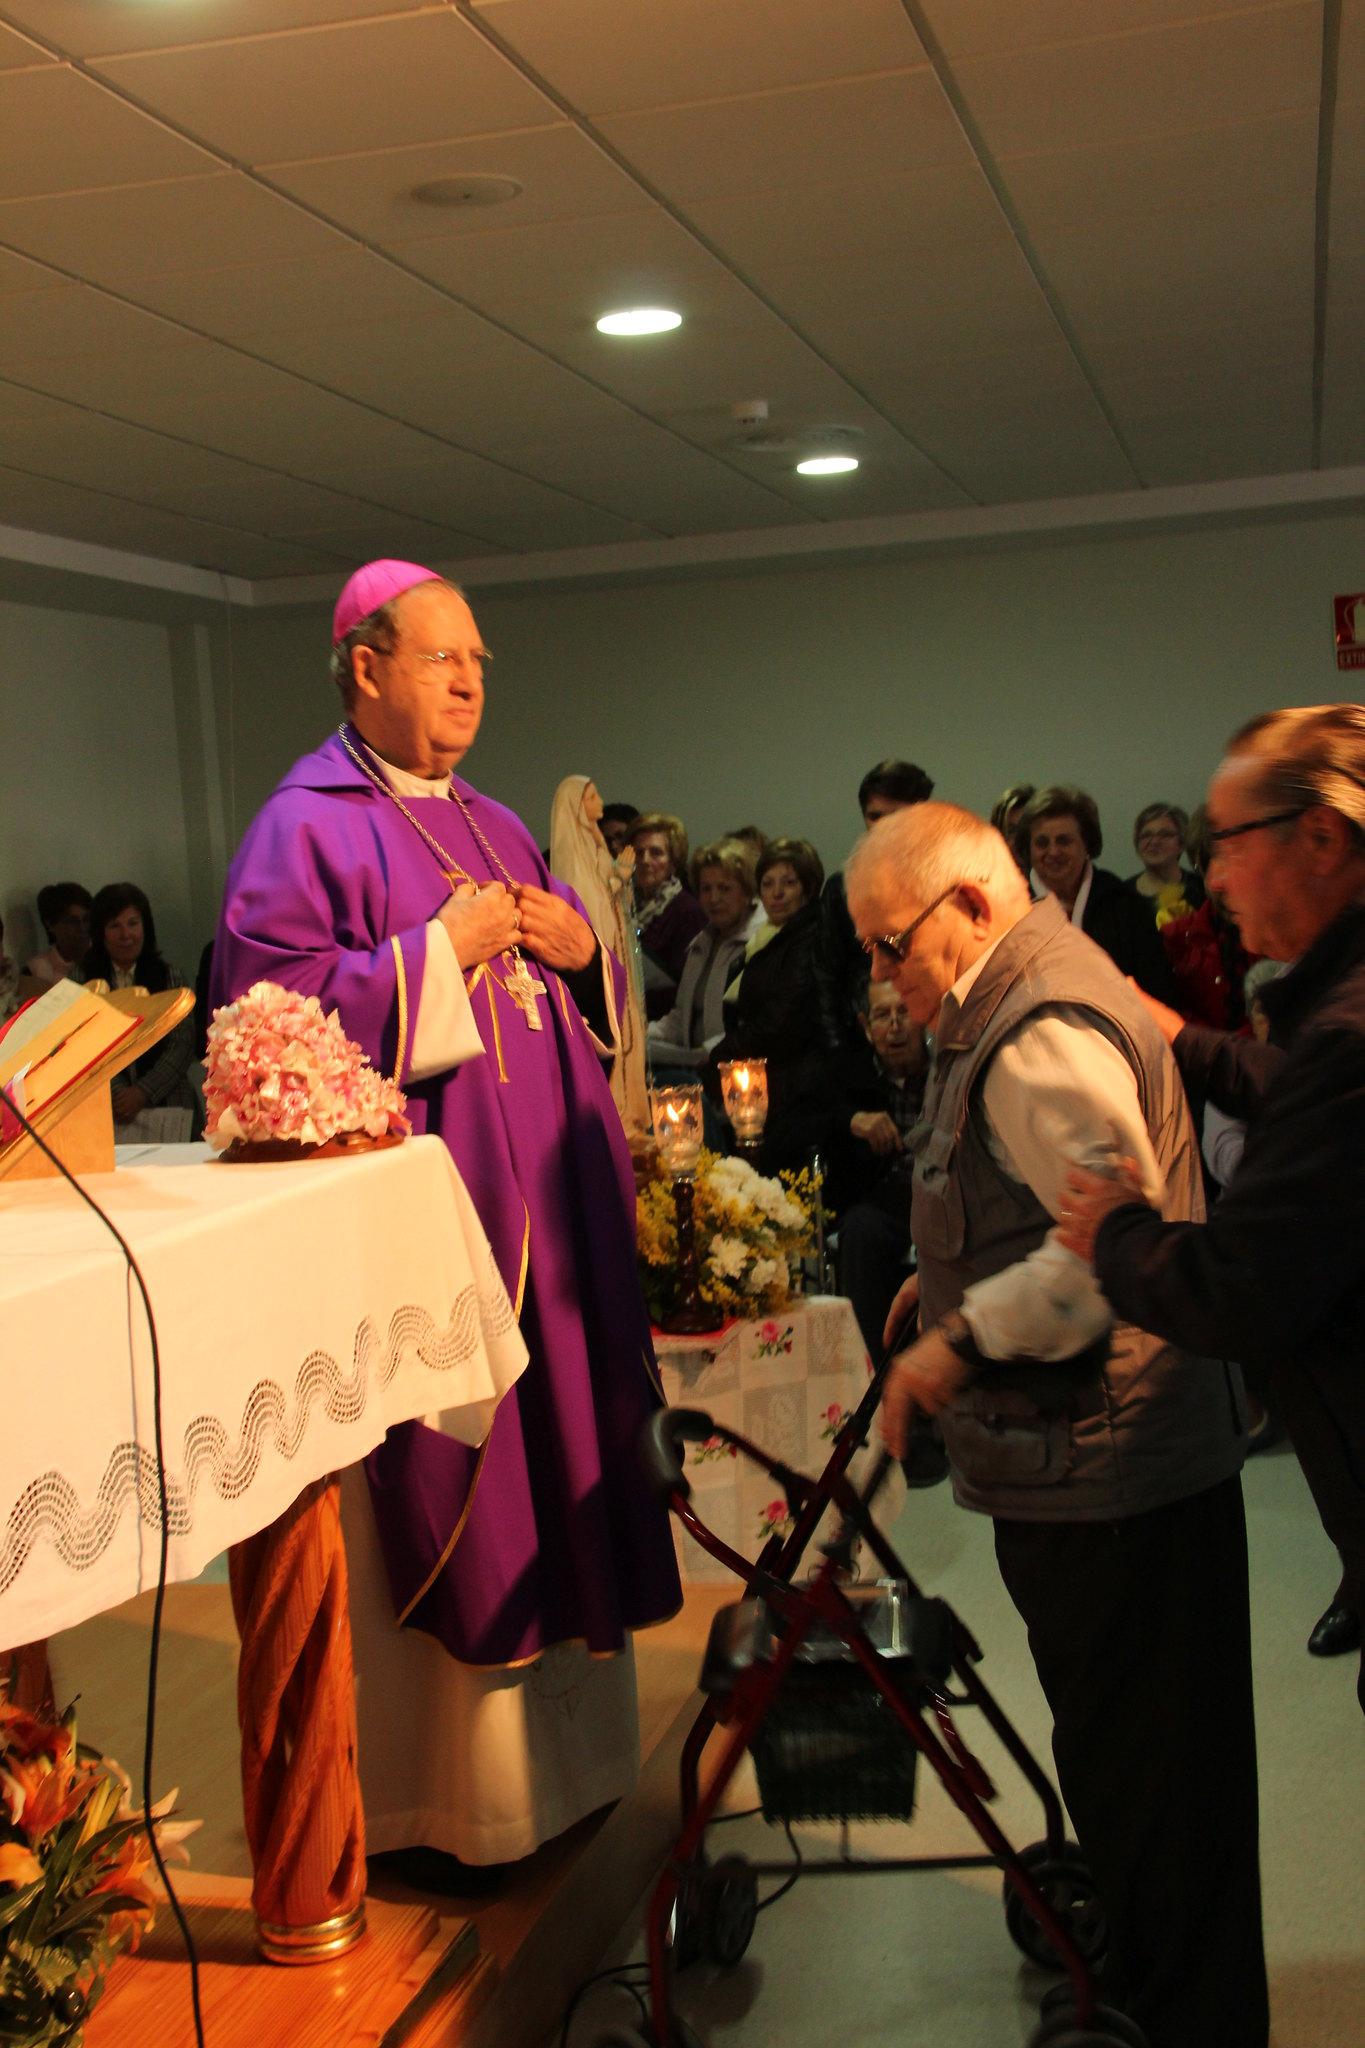 (2016-02-13) - Inauguración Virgen De Lourdes, La Molineta - Archivo La Molineta (037)